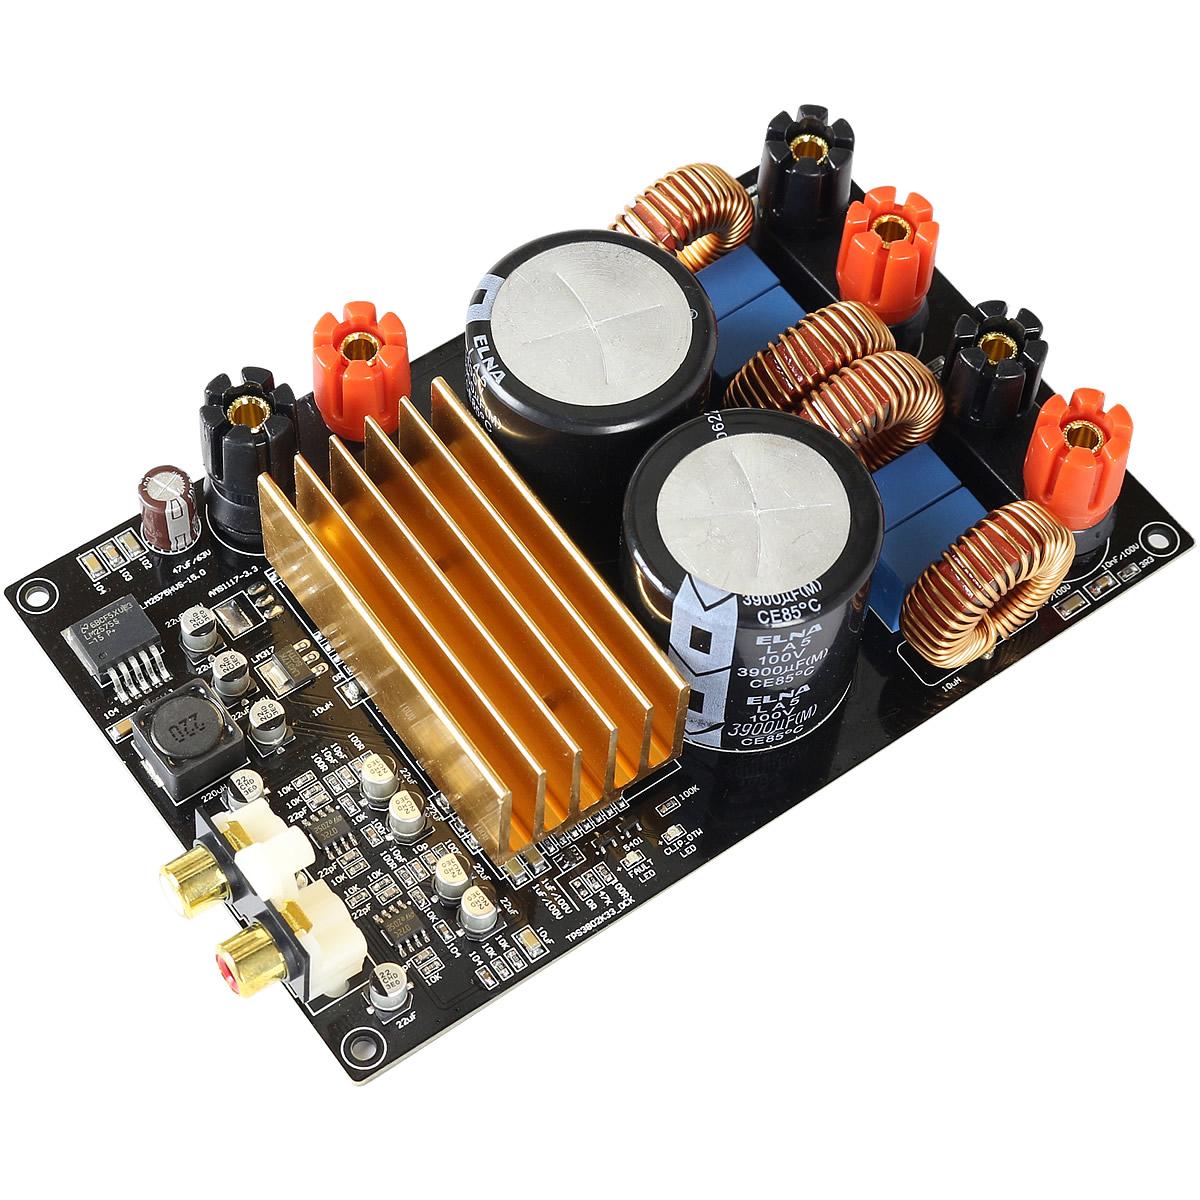 Ti Purepath Hd 150 Amplifier Module Class D Tpa3255 2x110w 8 Ohm Schematic Help Needed Diyaudio Amplificateur